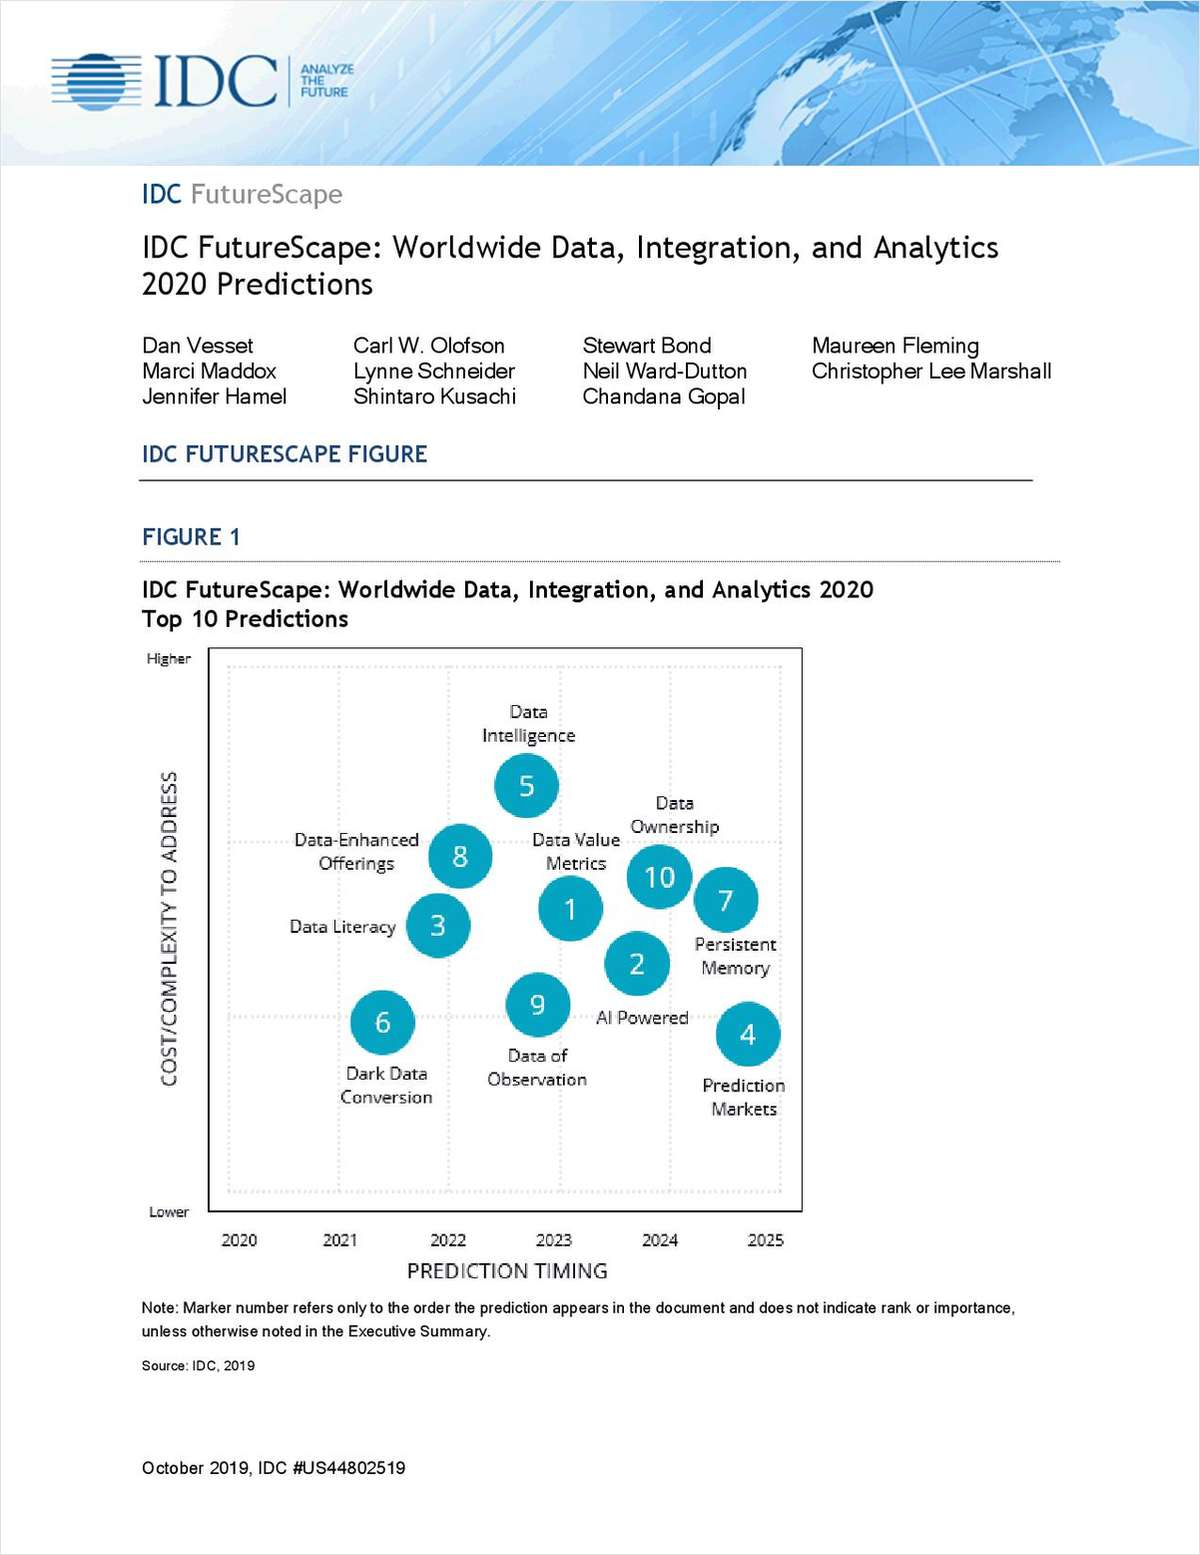 IDC FutureScape: Worldwide Data, Integration, and Analytics 2020 Predictions